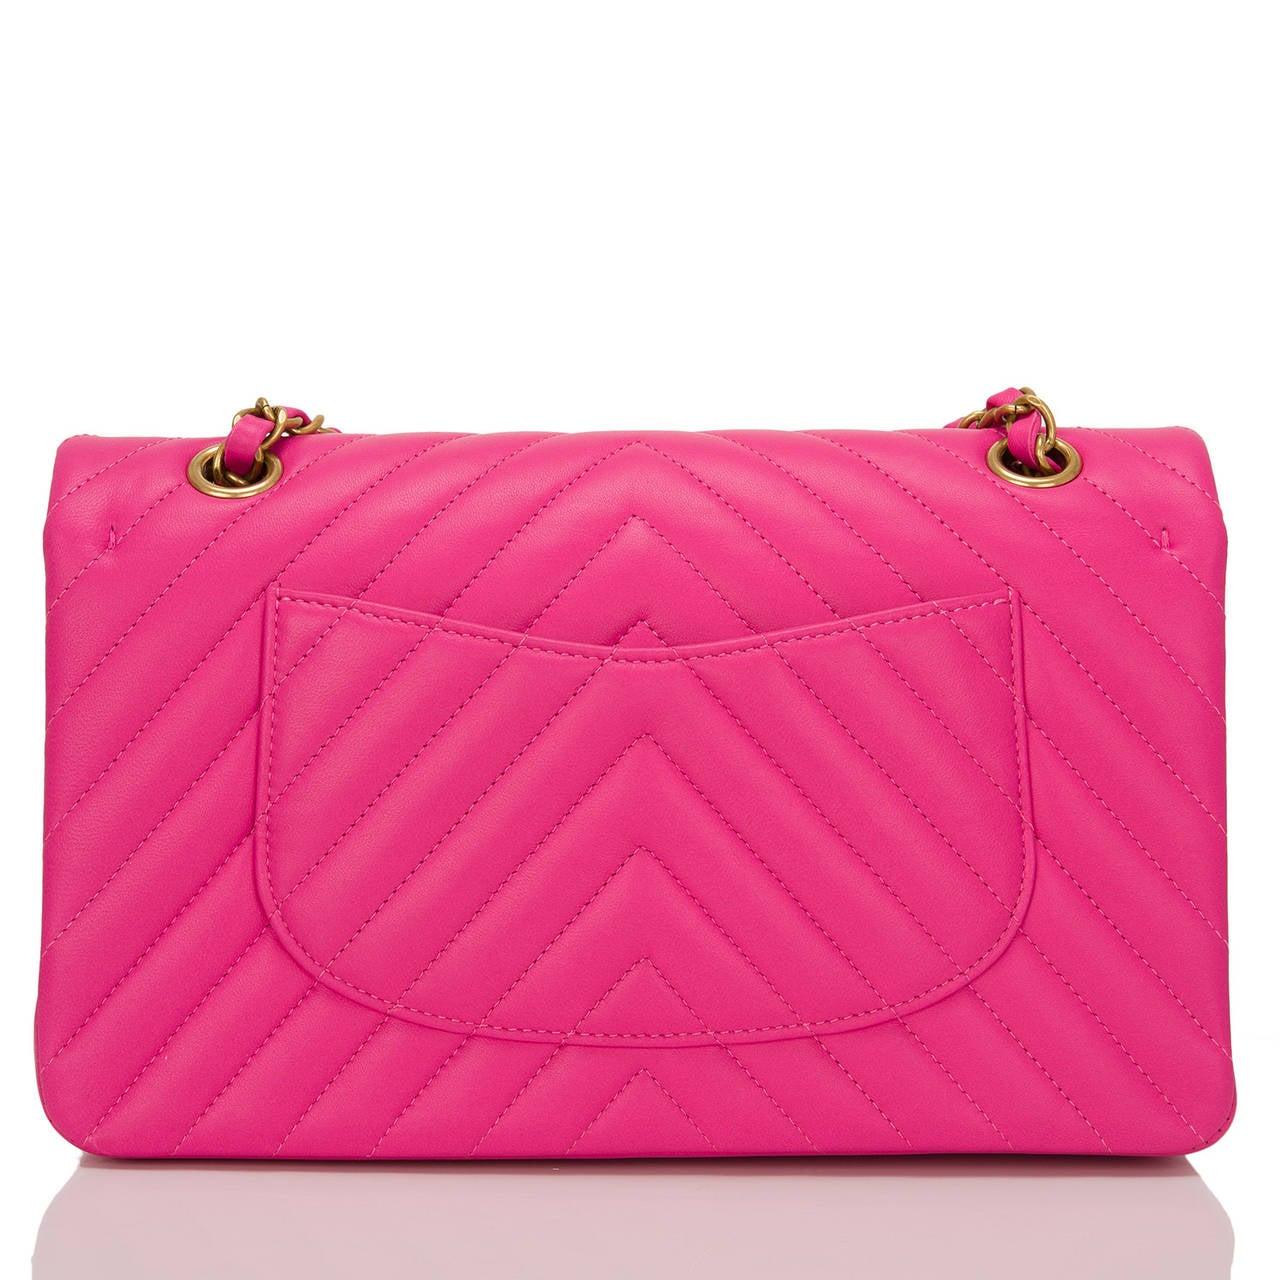 Pink Chanel Fuchsia Chevron Medium Classic Double Flap Bag For Sale